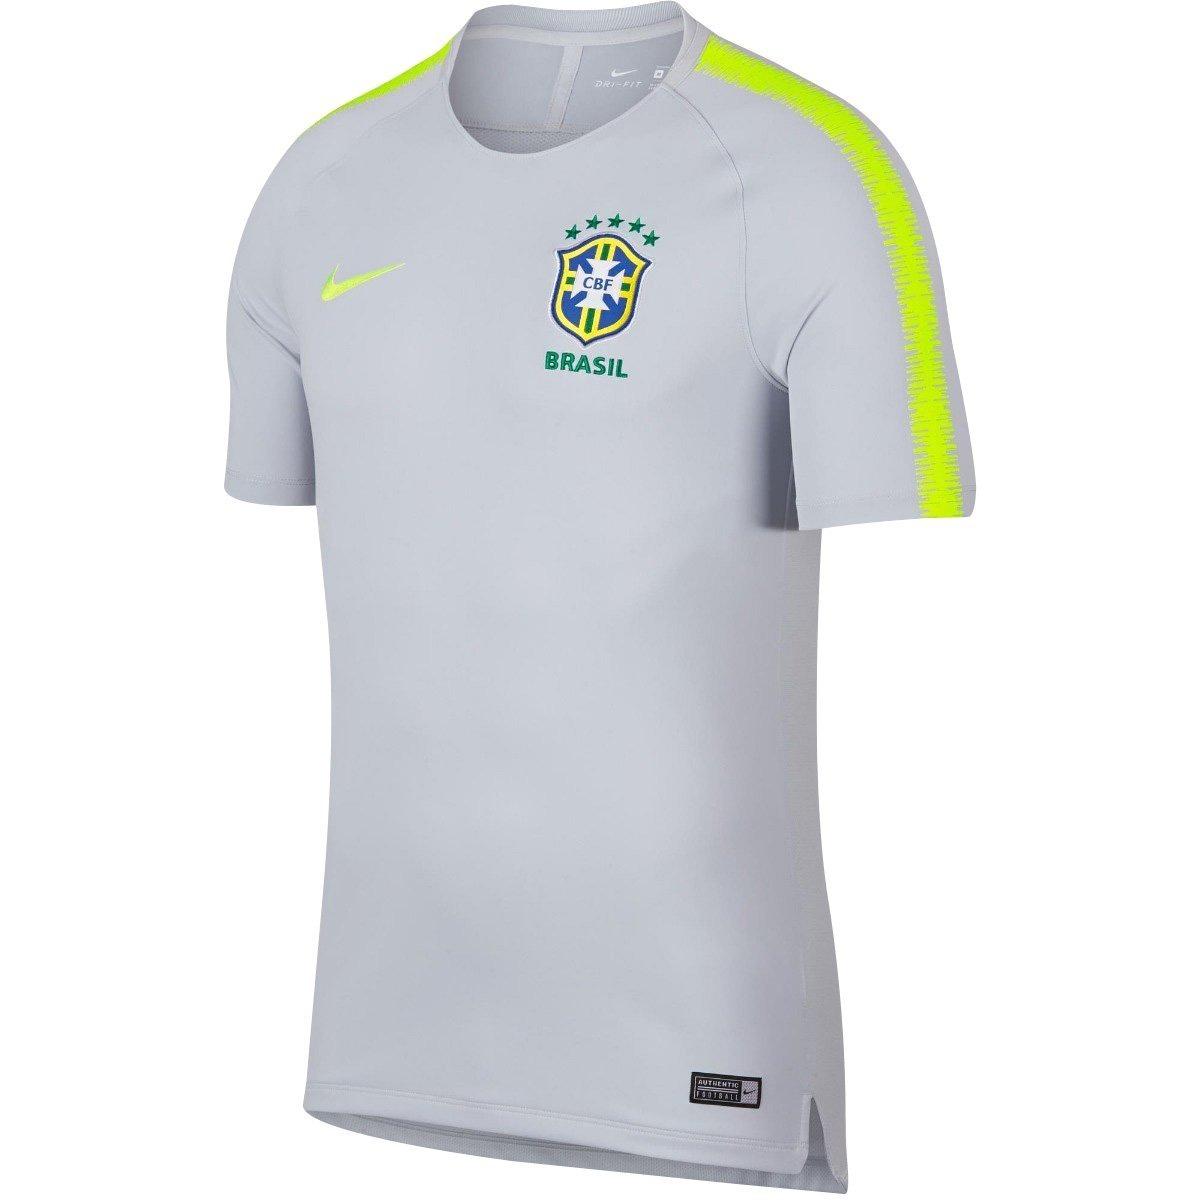 88c4855b4d3c1 Camisa Masculina Nike Brasil Cbf Treino Breathe Original+nf - R  189 ...